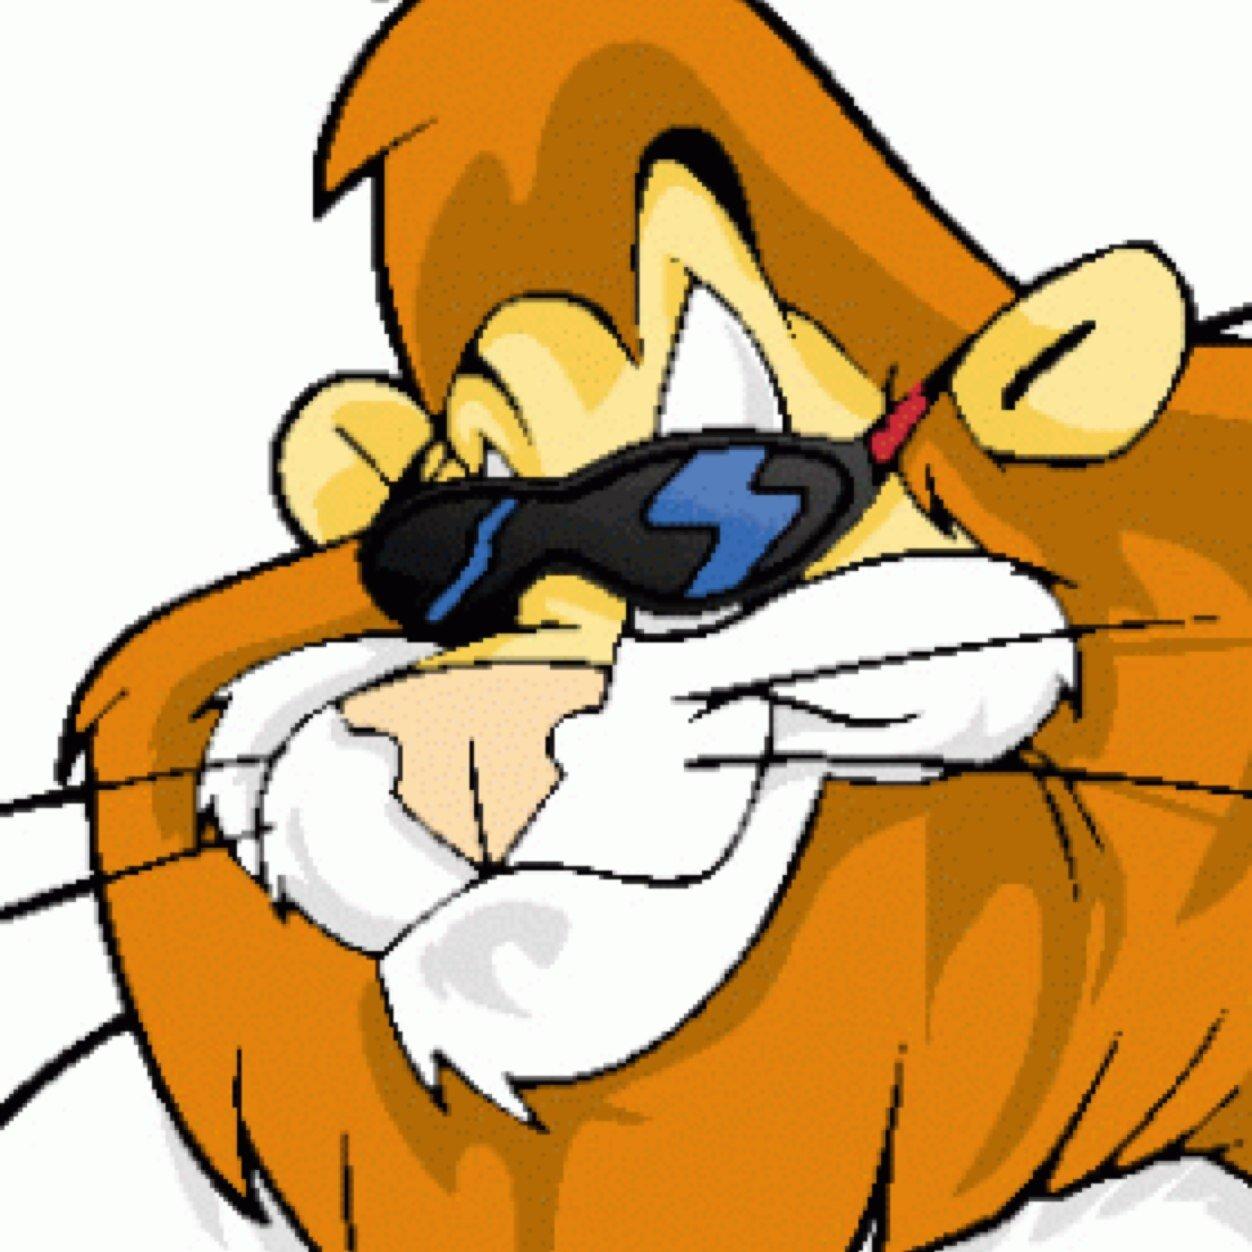 Daren the Lion (@DarentheLion).